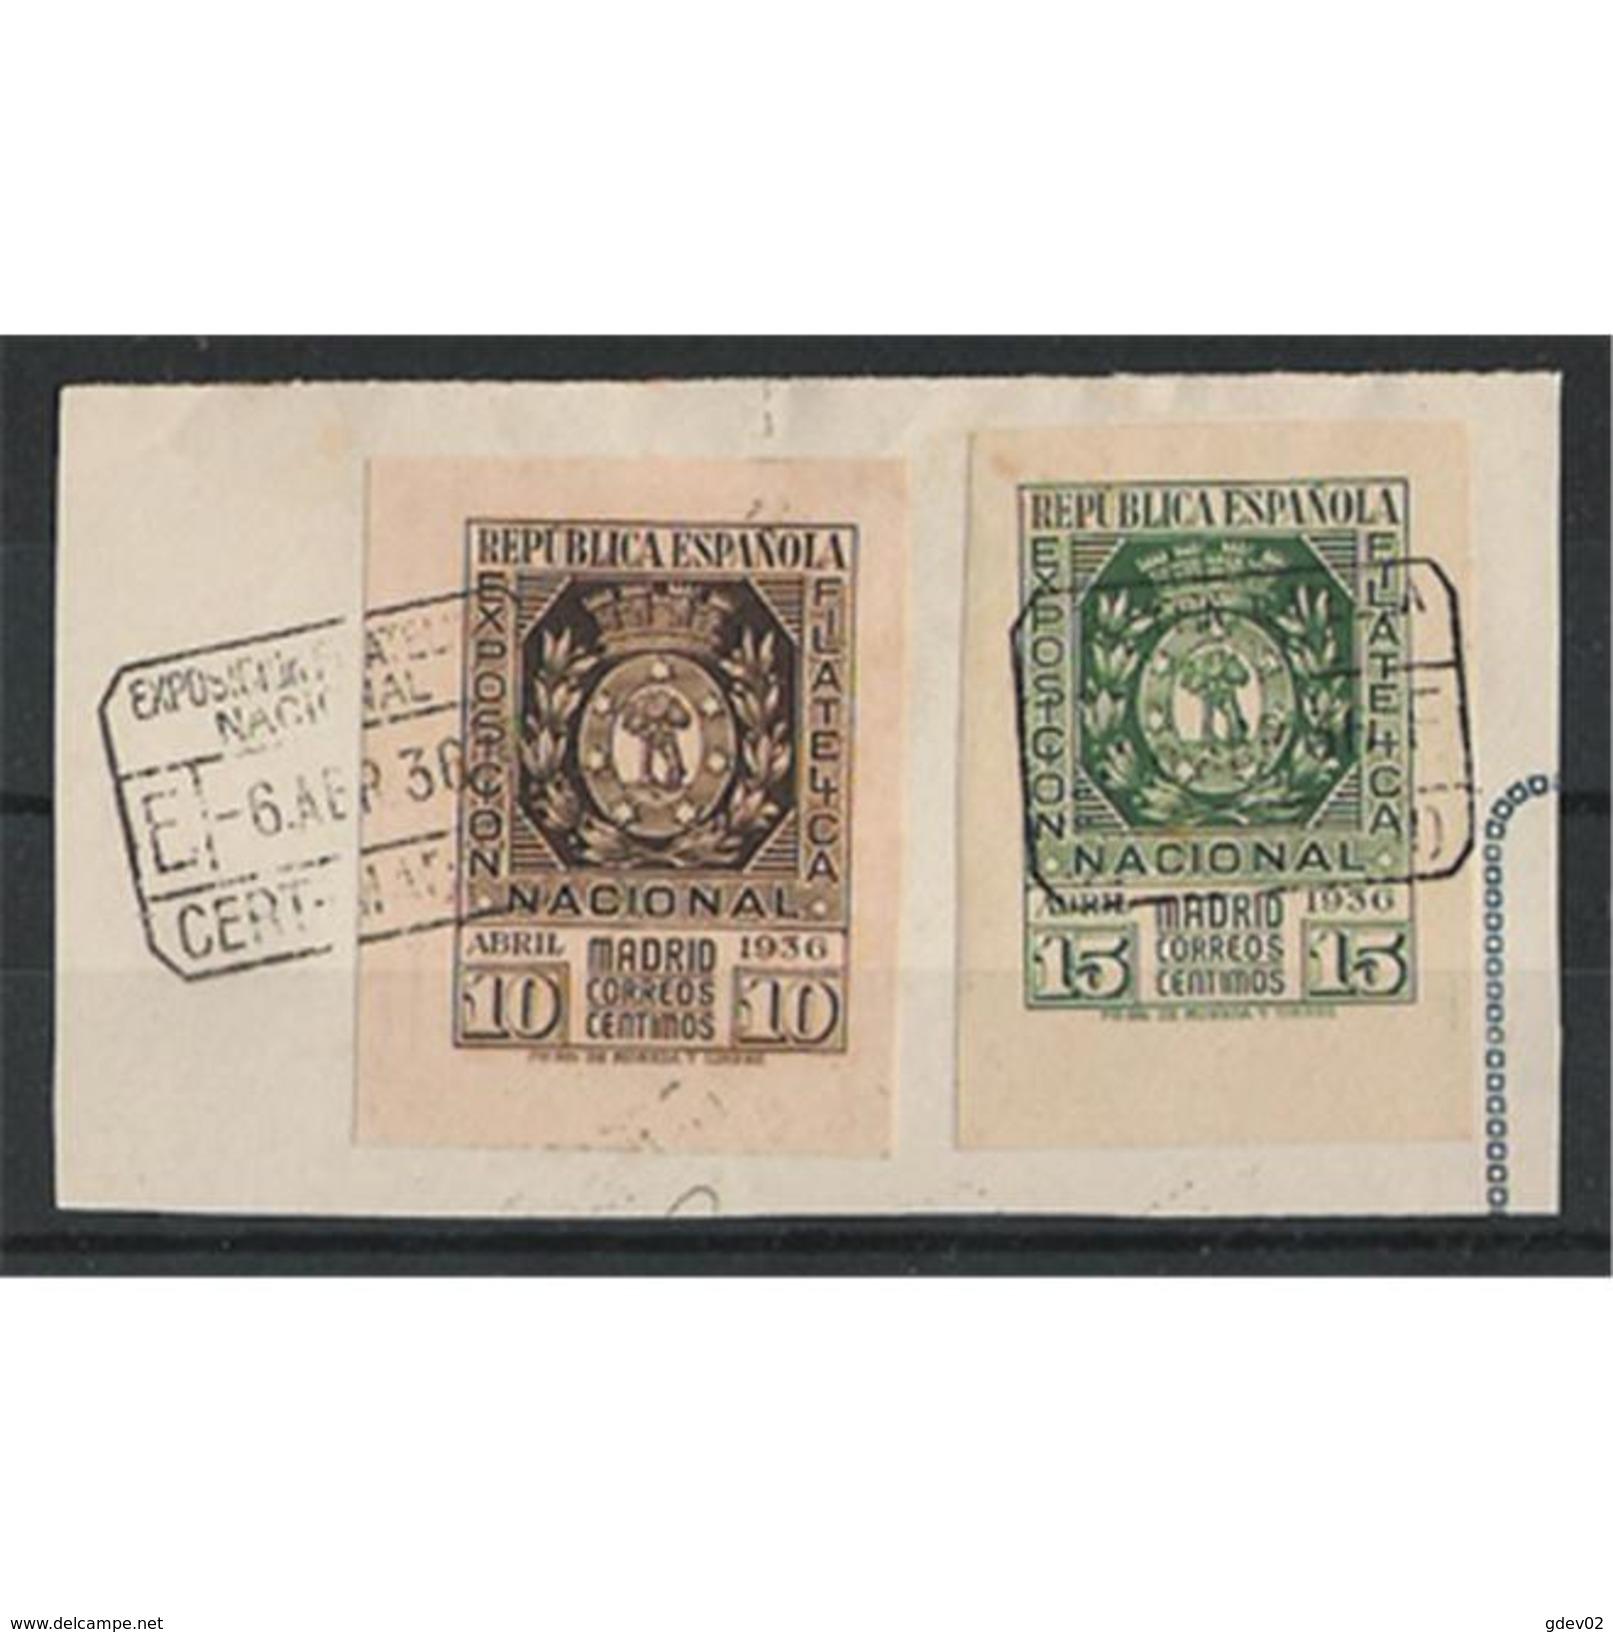 ES727STVCPA-LFTU727/8TES.España. Spain.Espagne.Escudo.EXPOSICION FILATELICA DE MADRID.1936/8.( Ed 727/28º) - Sellos